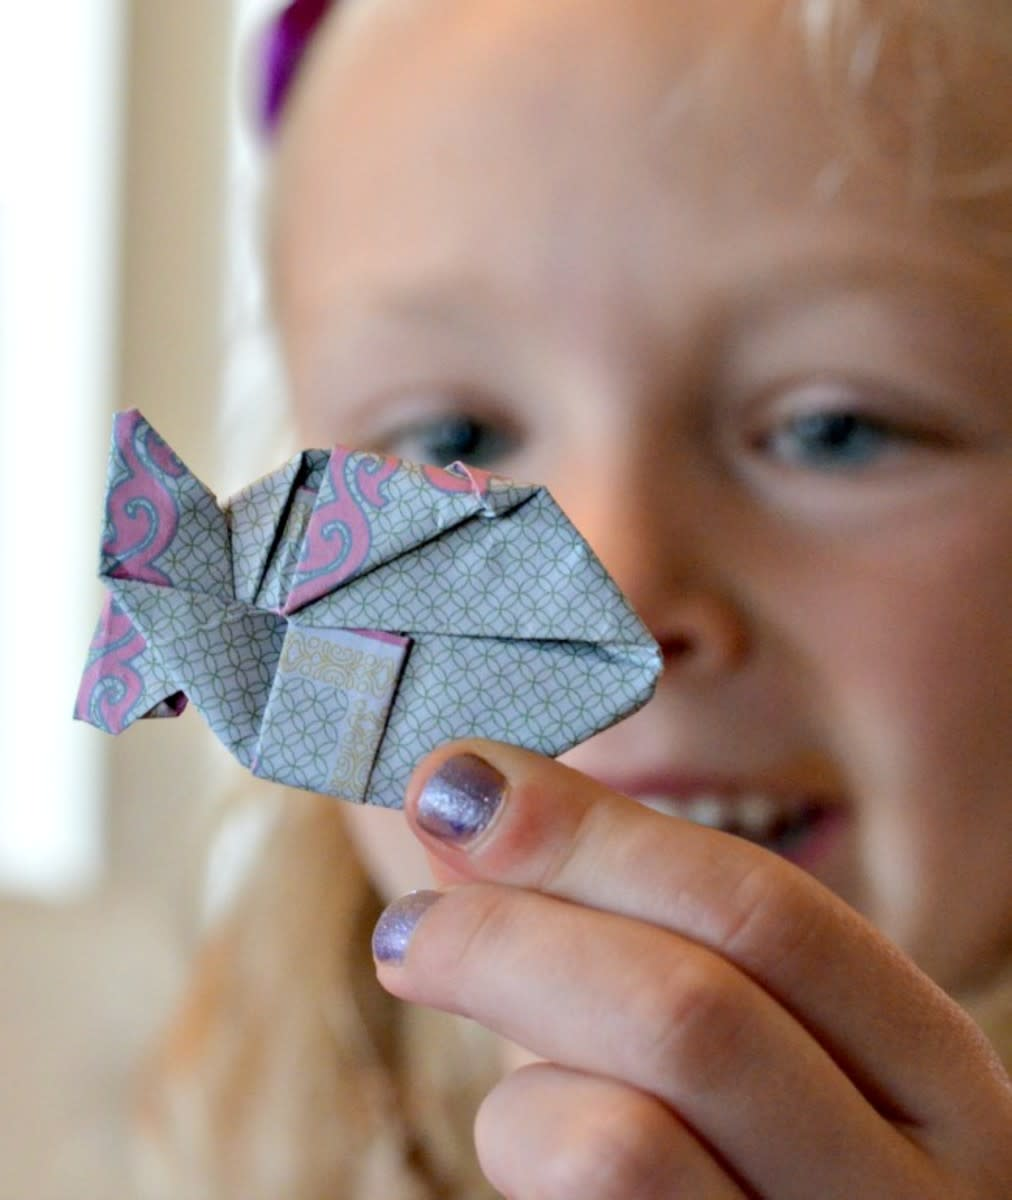 Celebrate With Kids Around The World: Japanese Children's Day